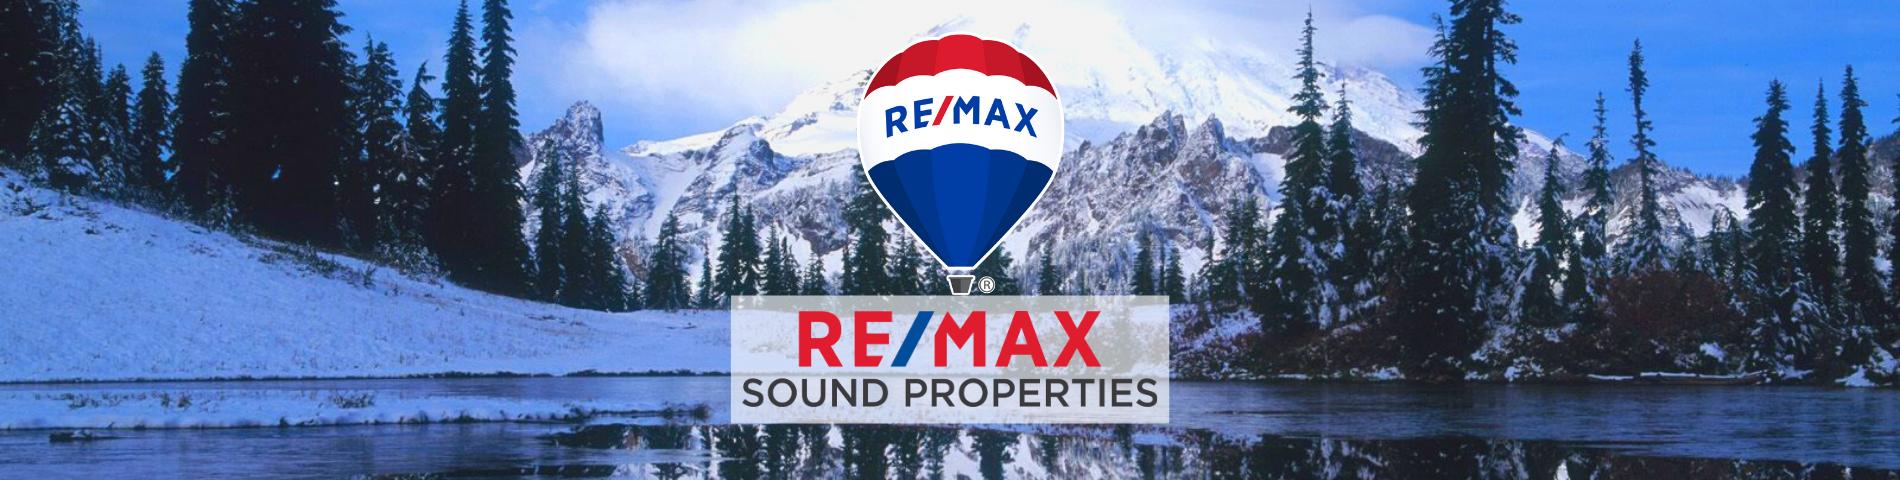 RE/MAX Sound Properties - WA